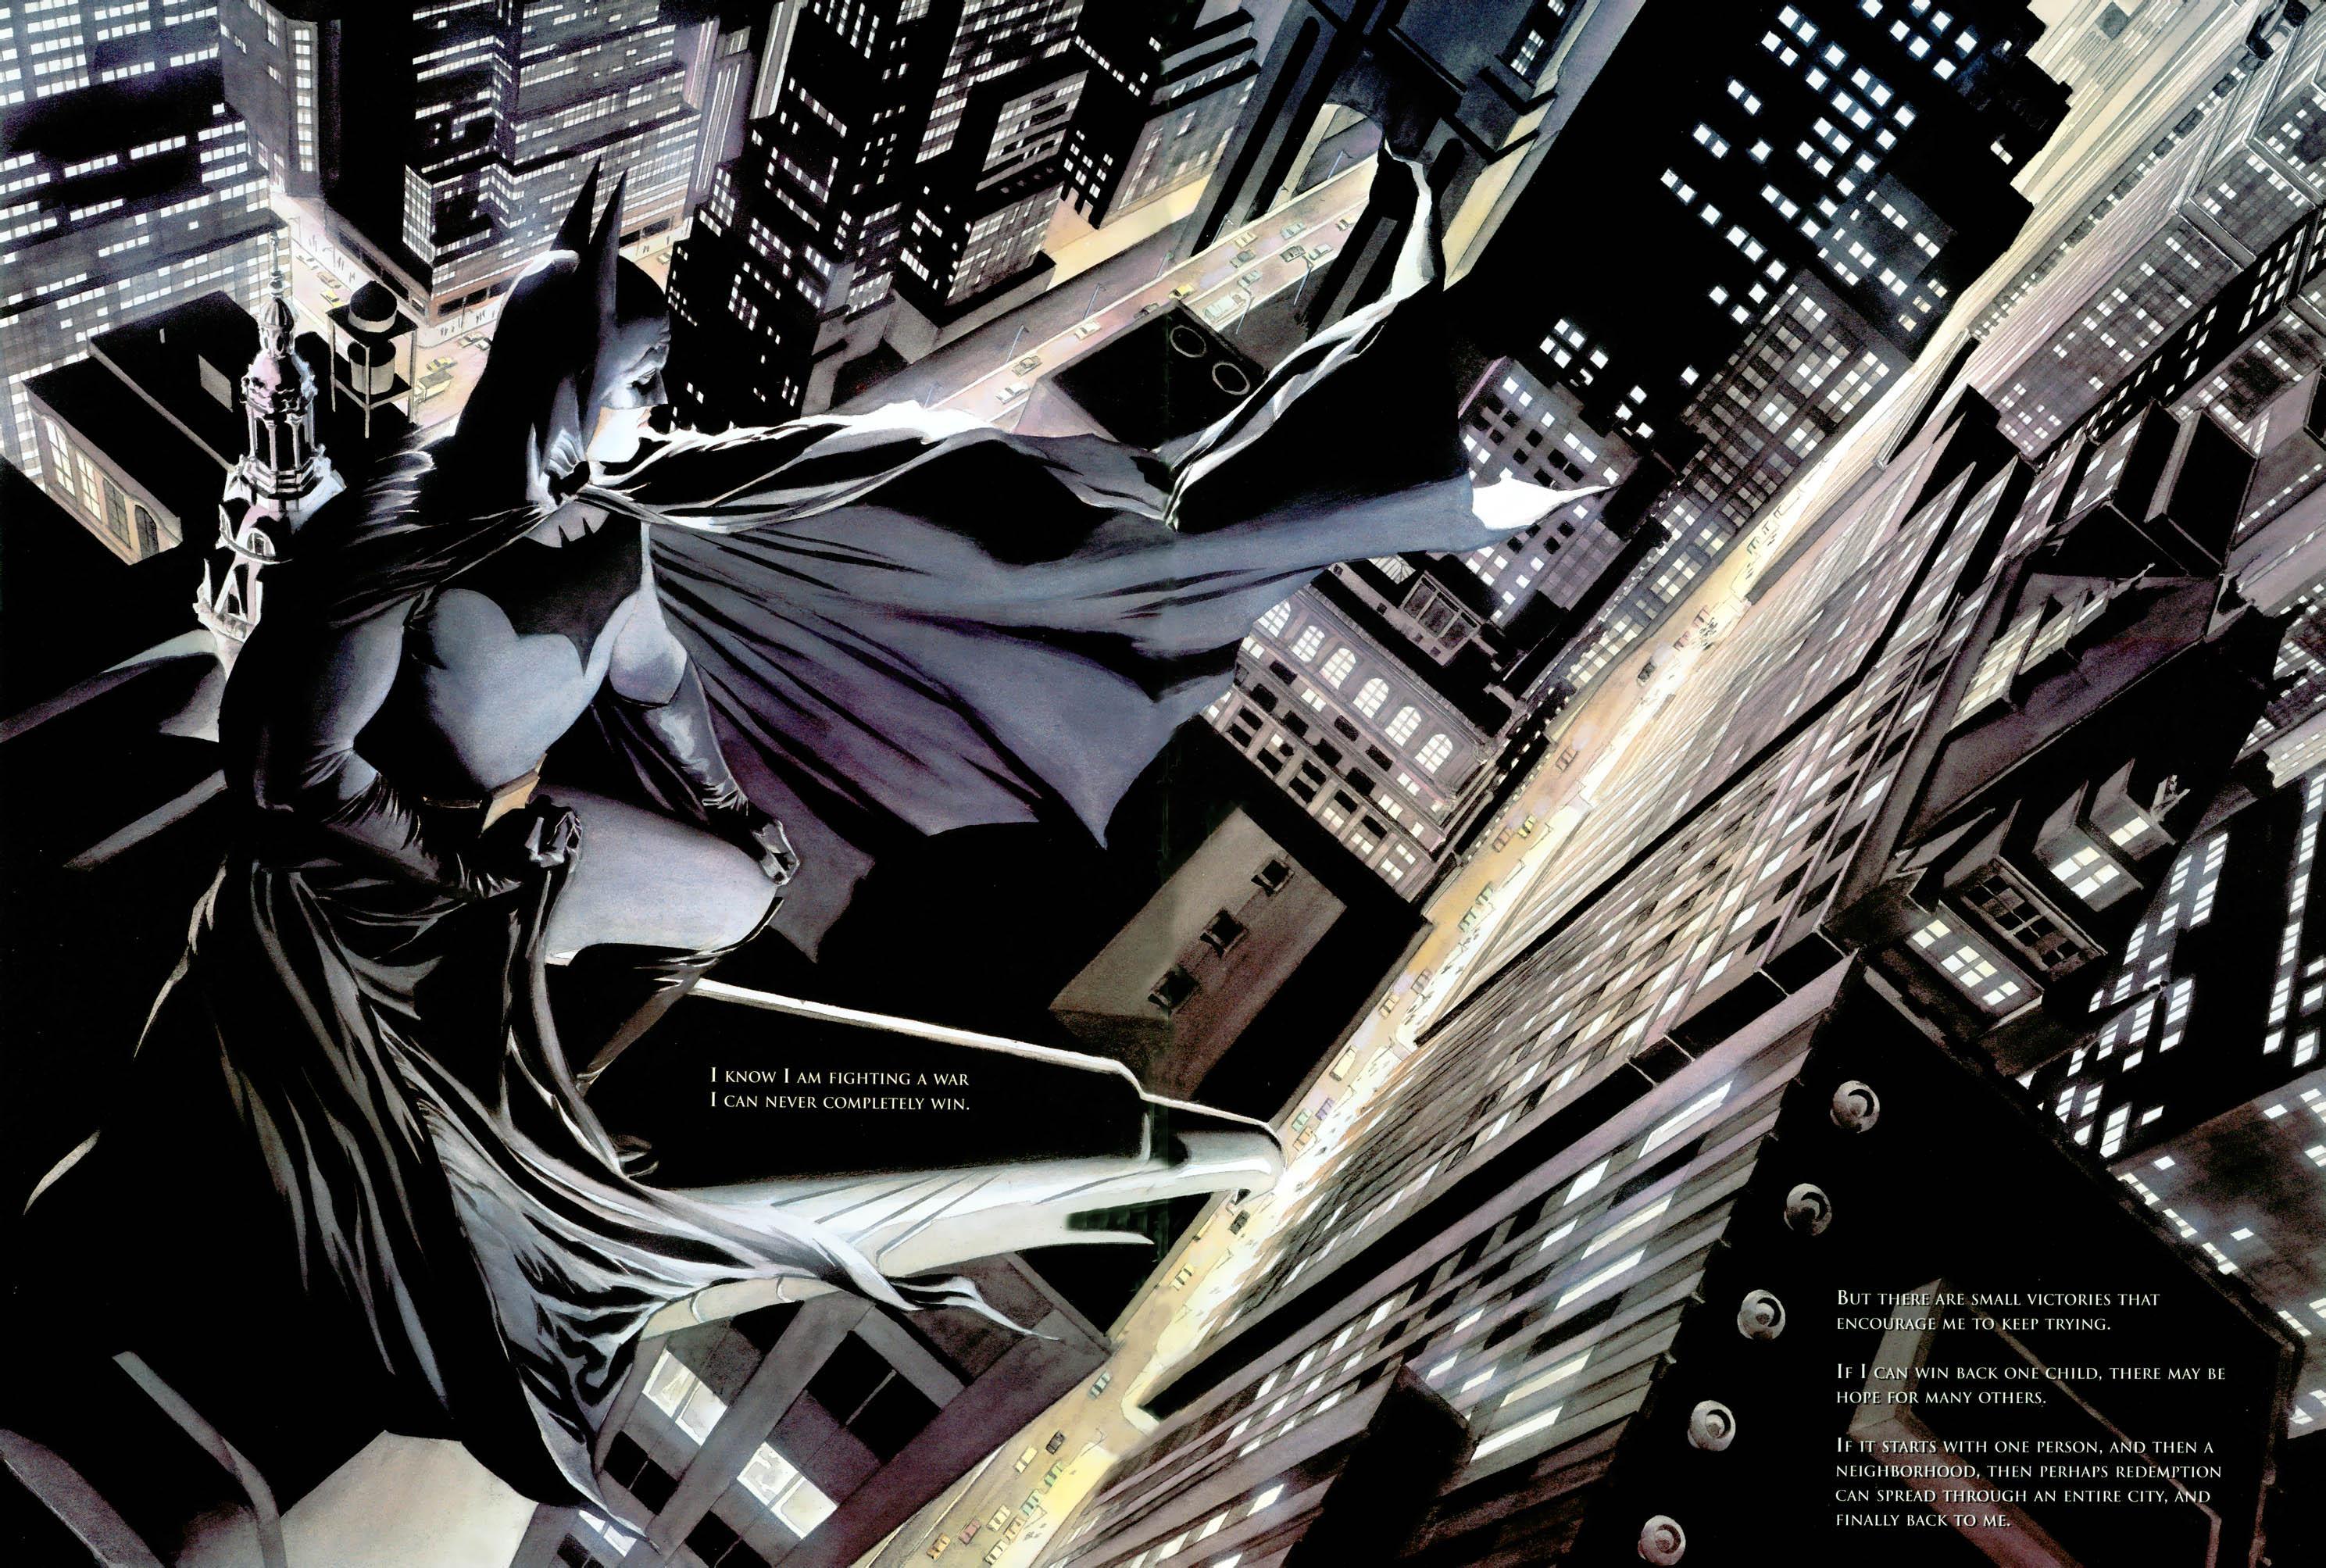 Batman War on Crime review